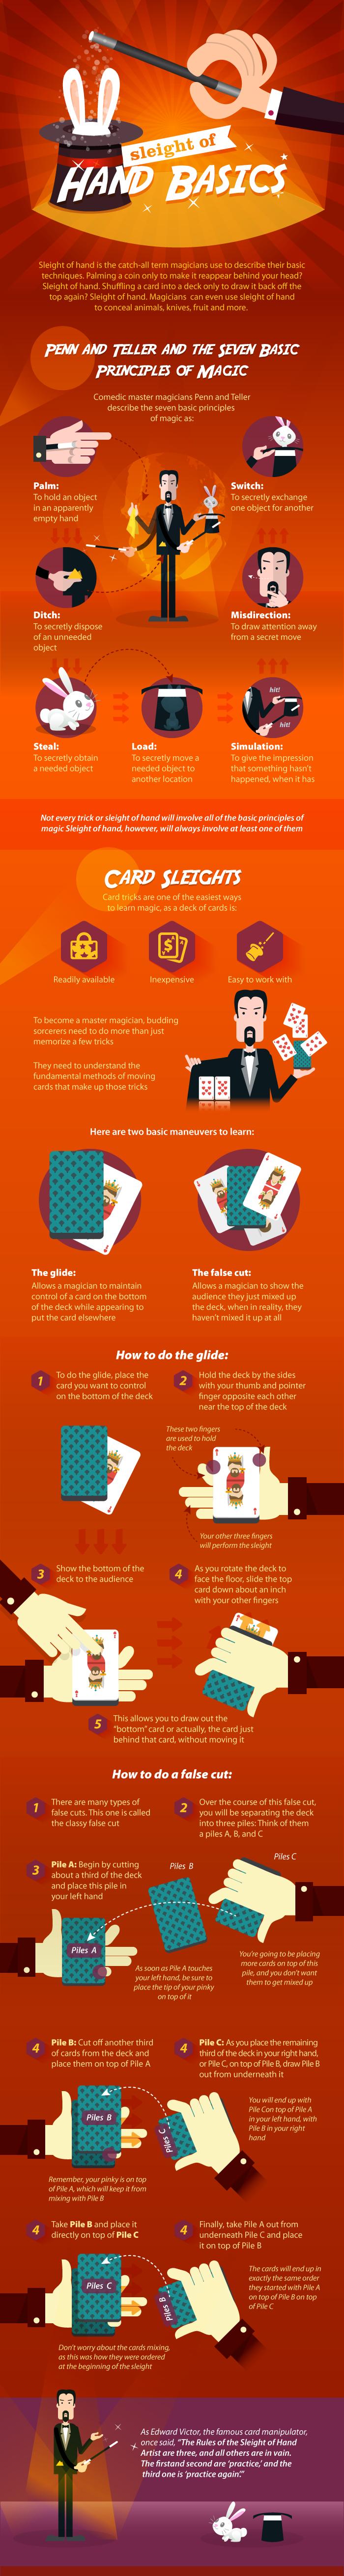 Sleight Of Hand Card Magic Tricks